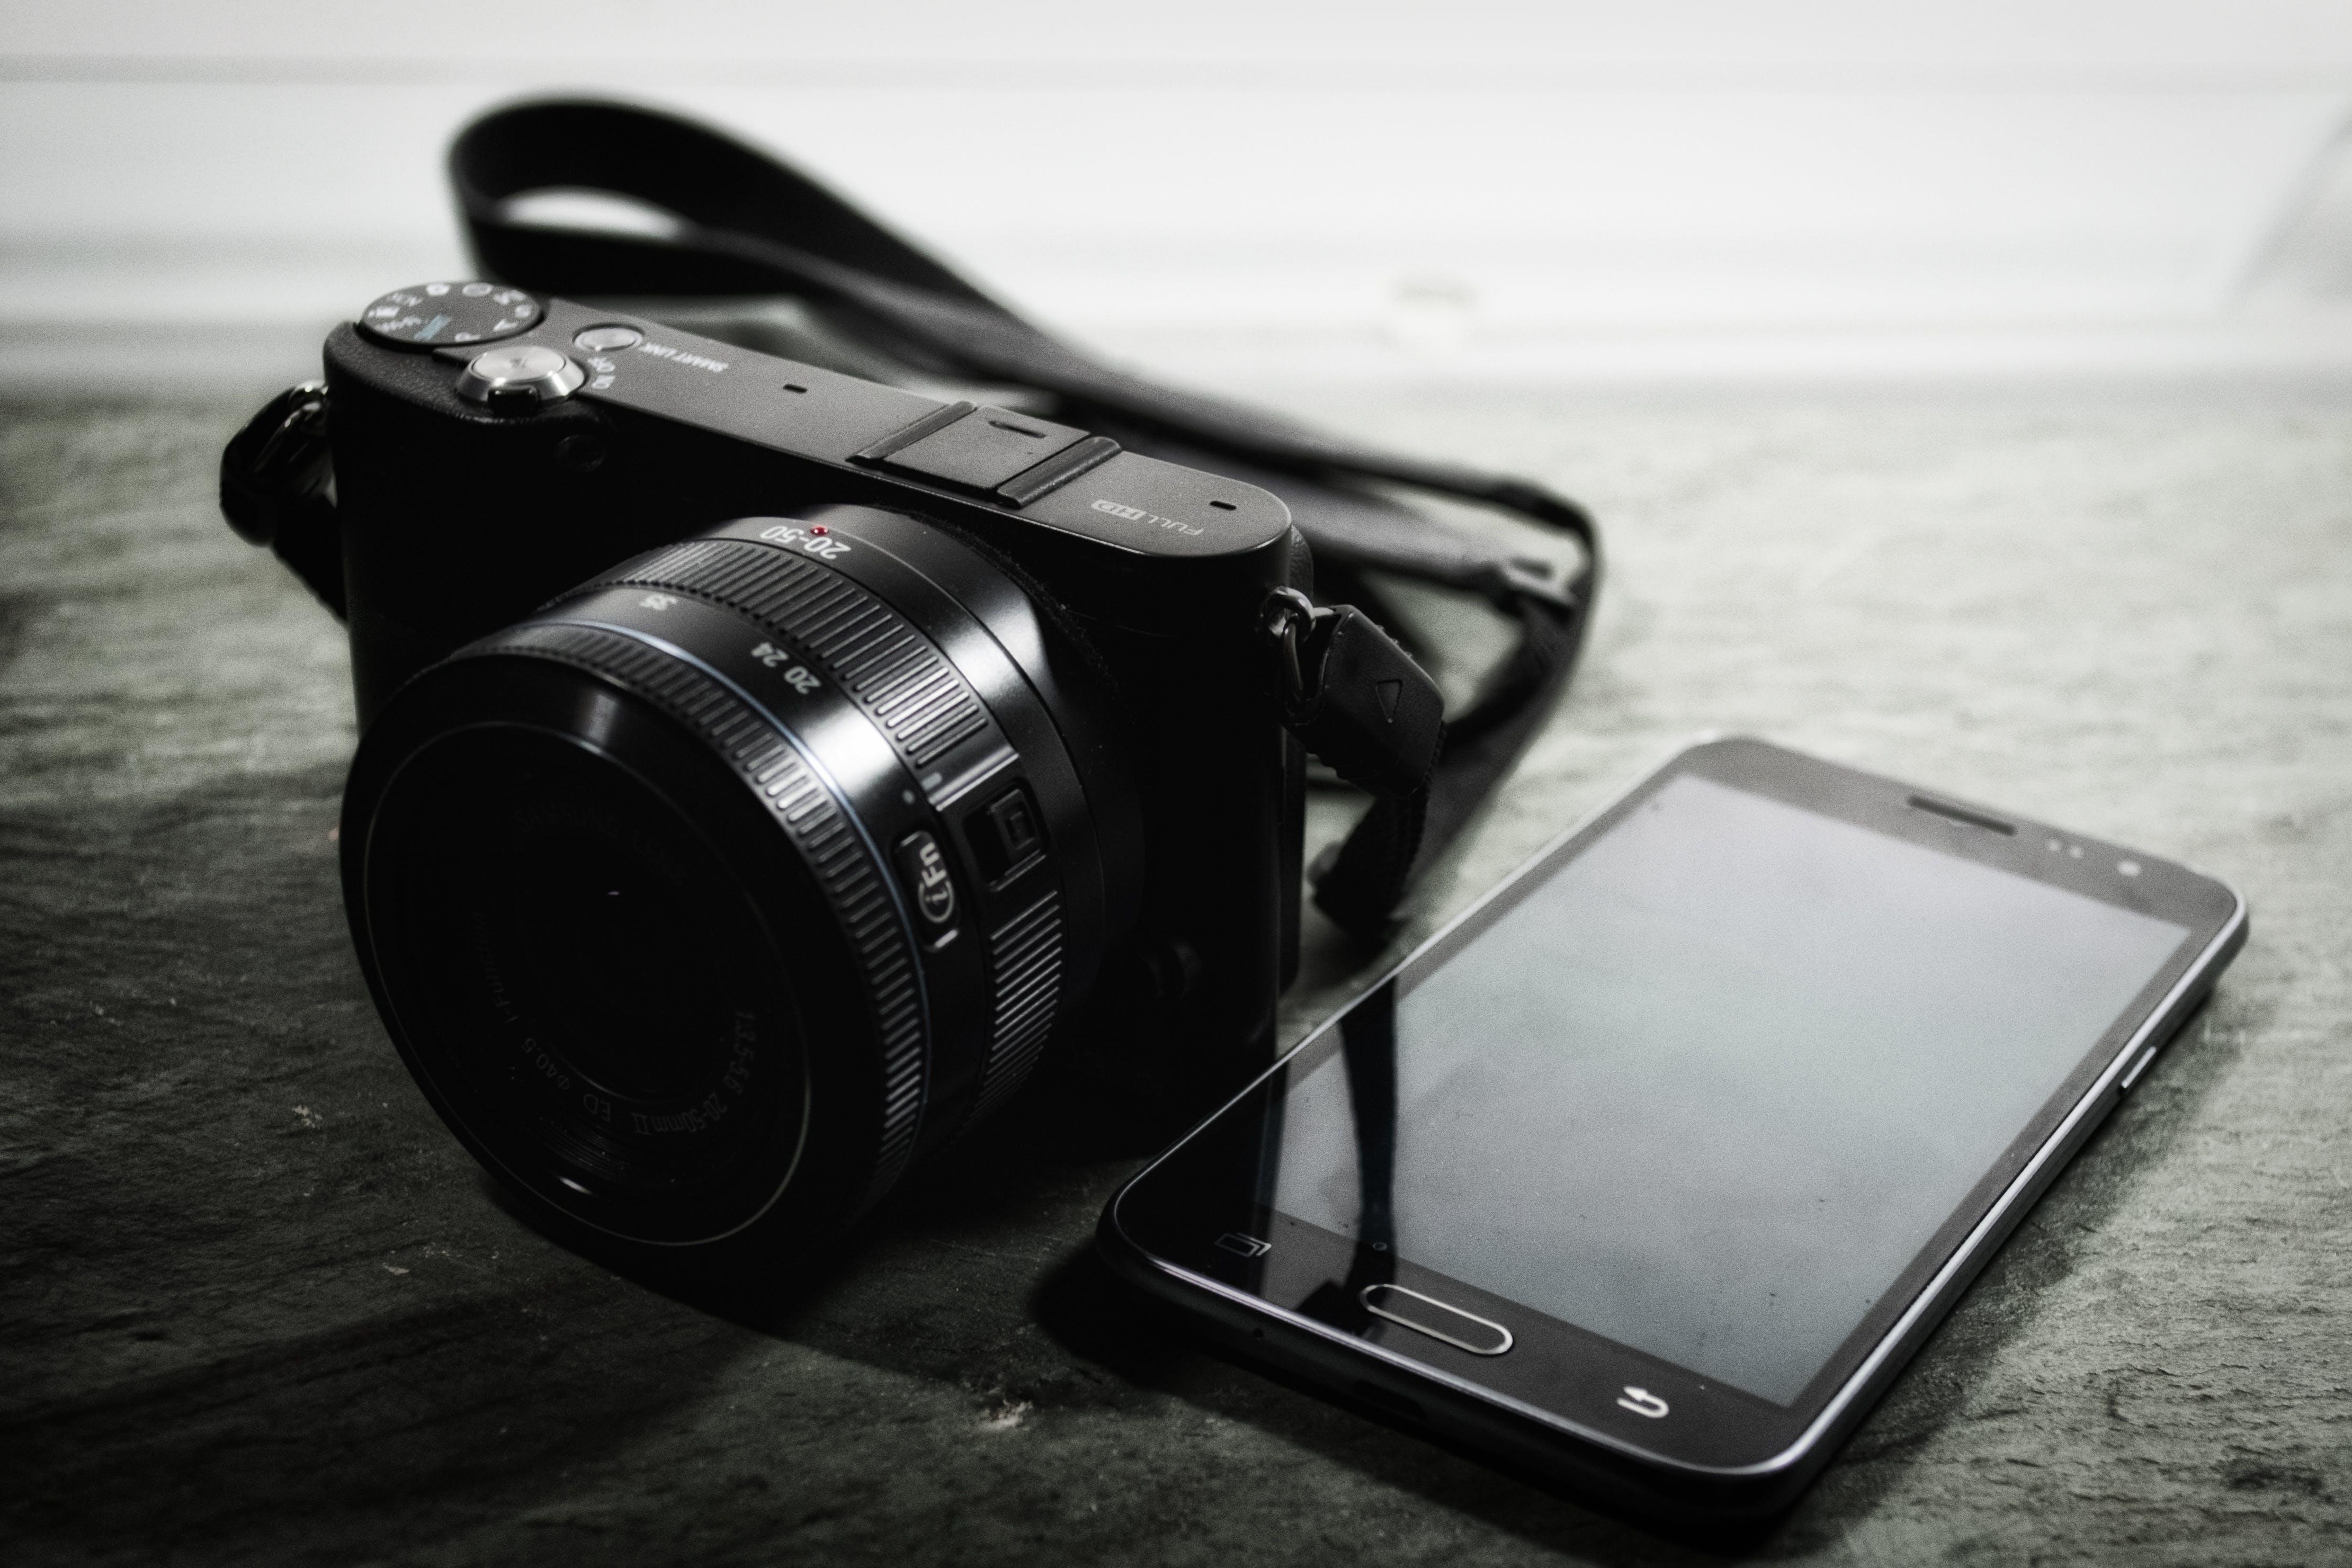 Bridge Camera Beside Samsung Smartphone